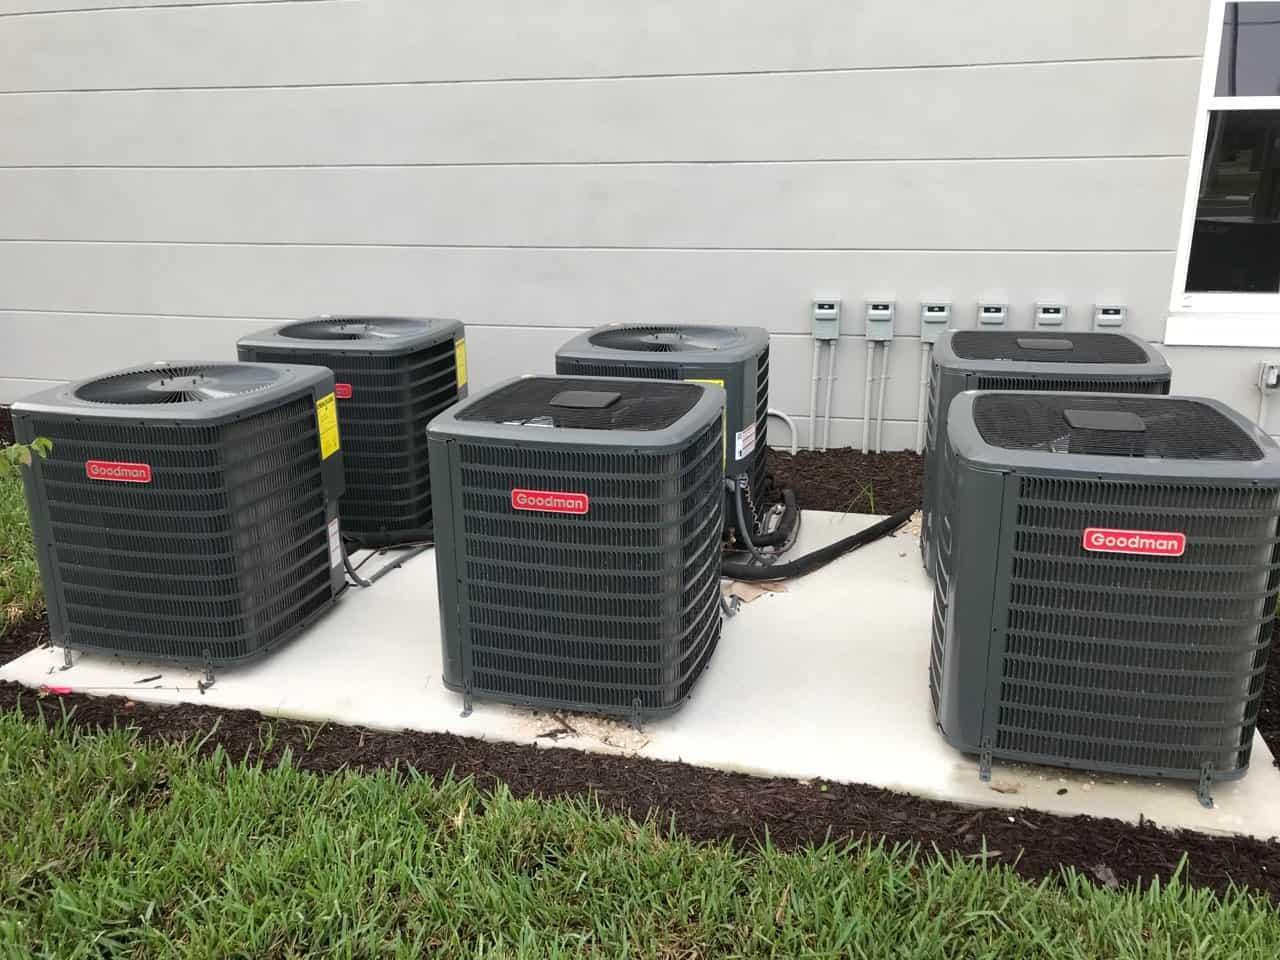 Goodman AC units